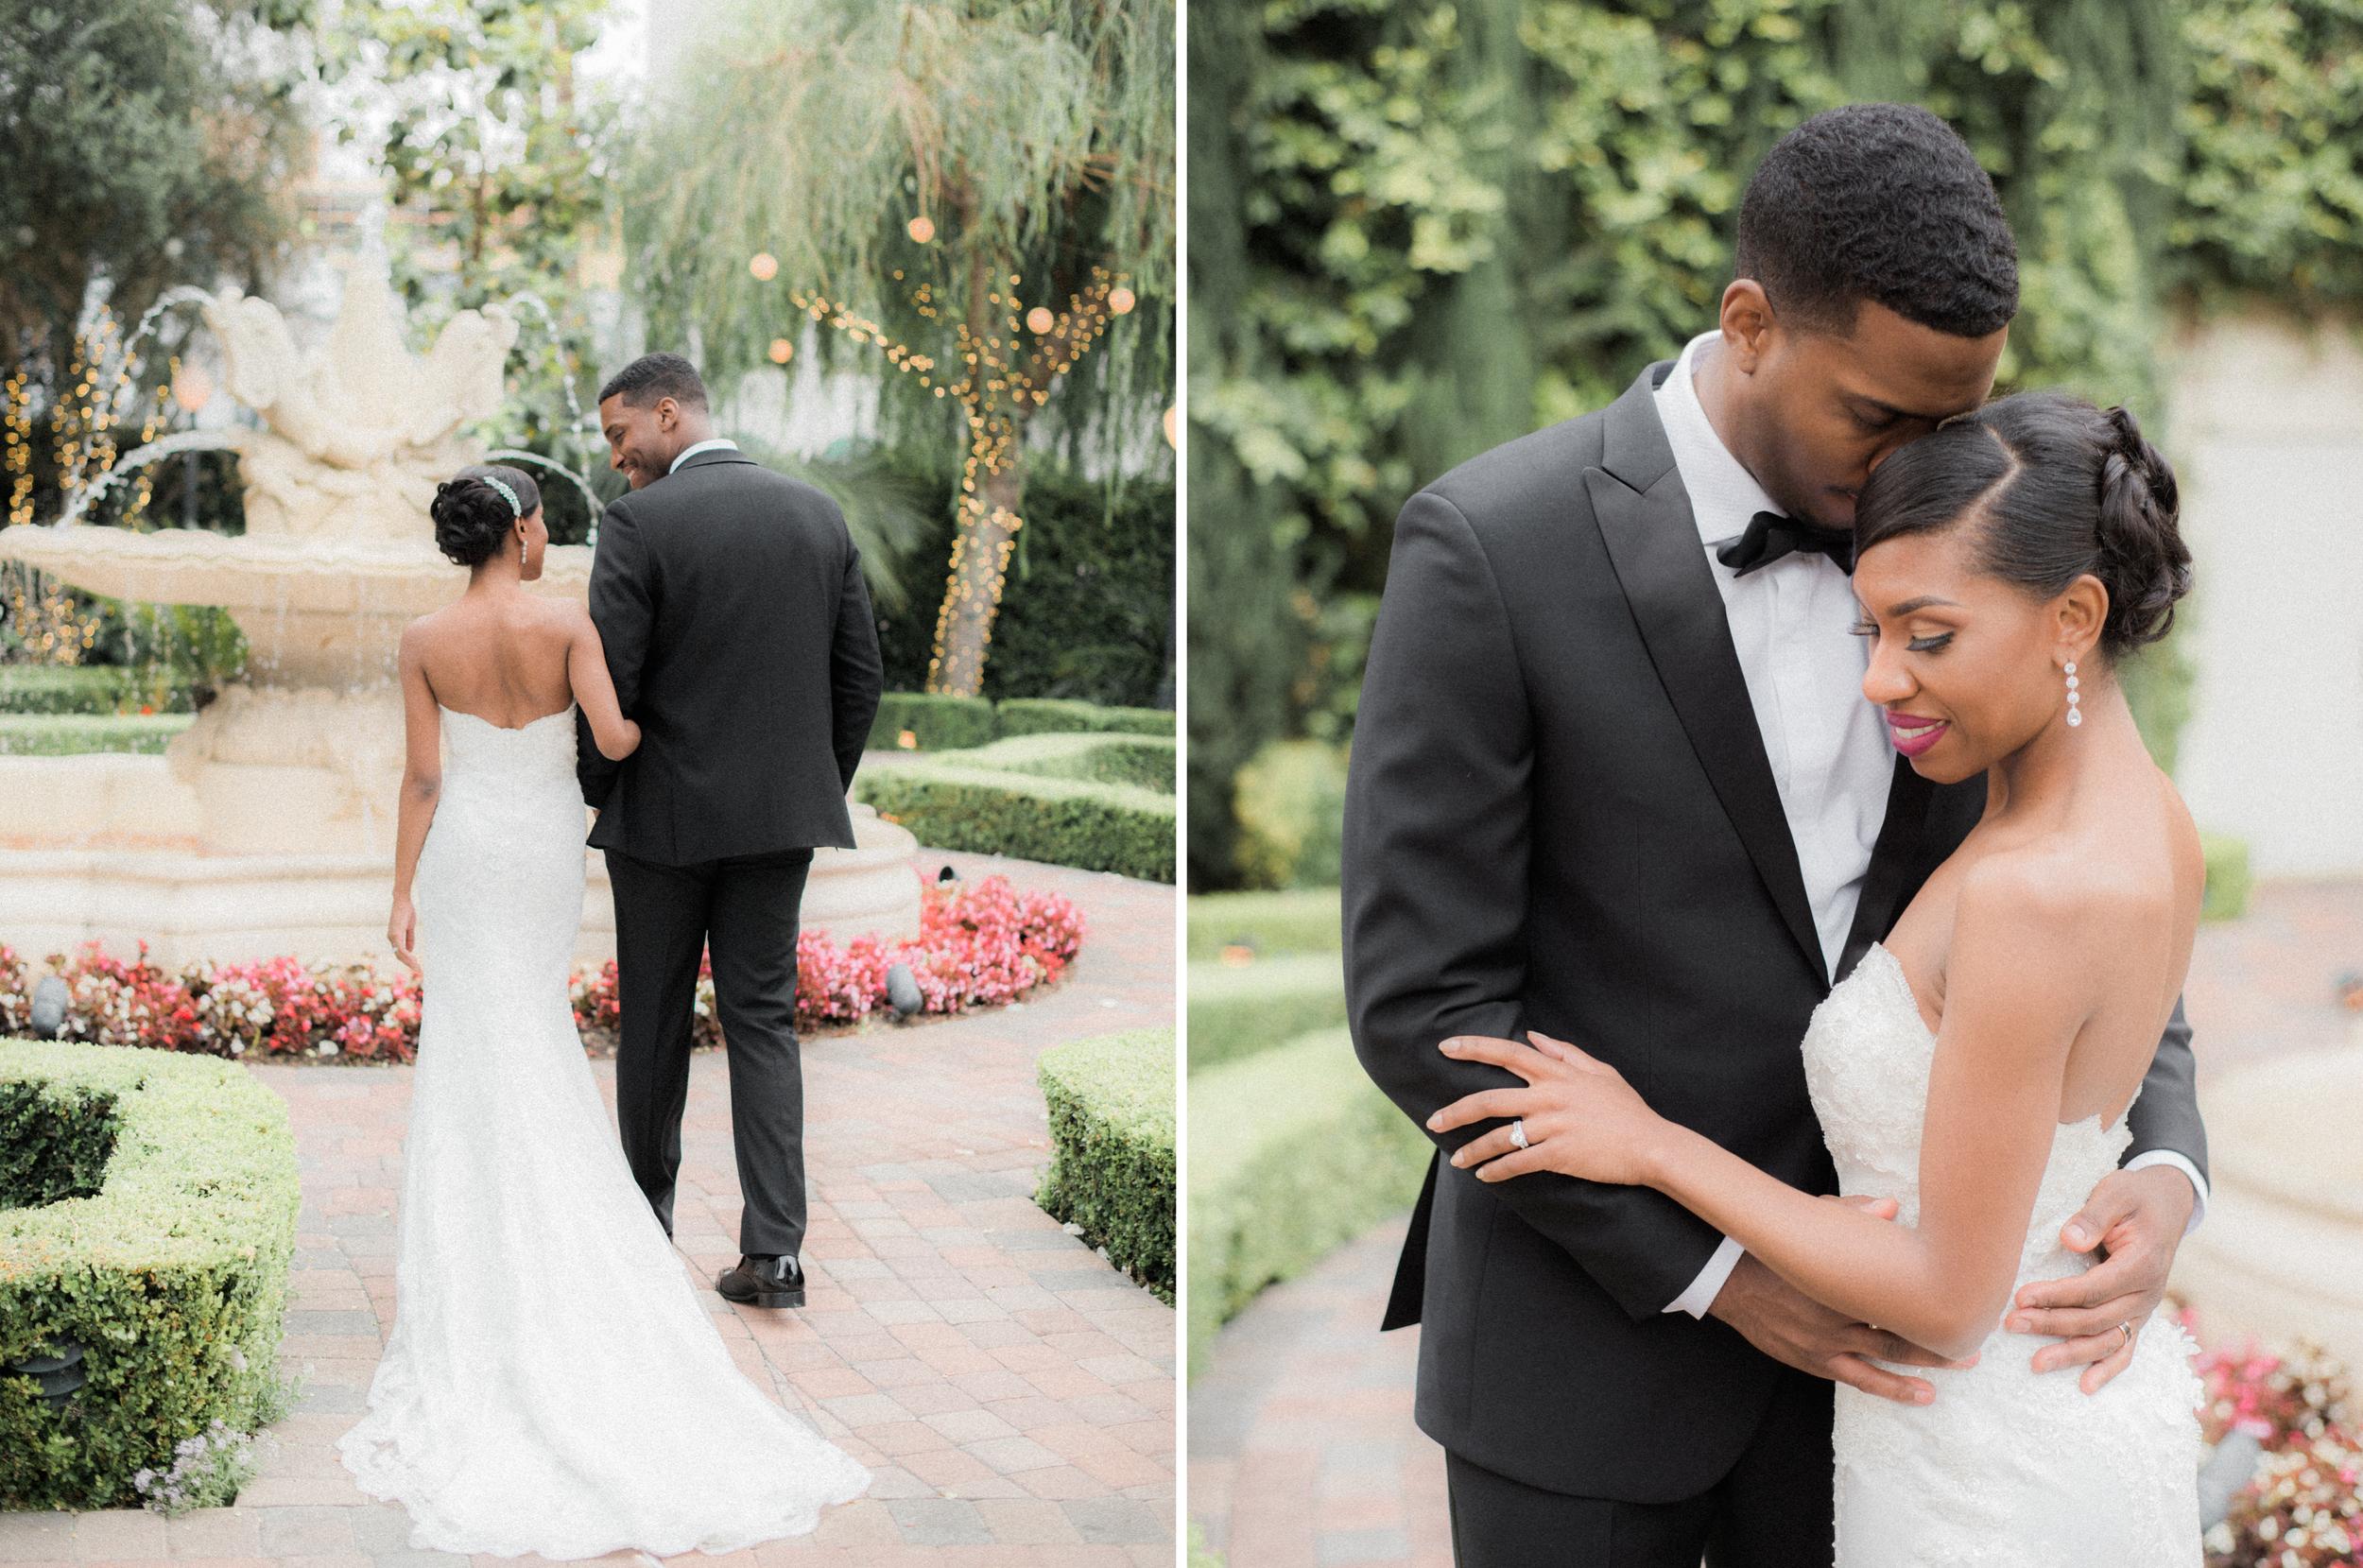 jessica&curtis_the_taglyan_complex_roosevelt_hotel_hollywood_wedding_los_angeles_photographer-36.jpg